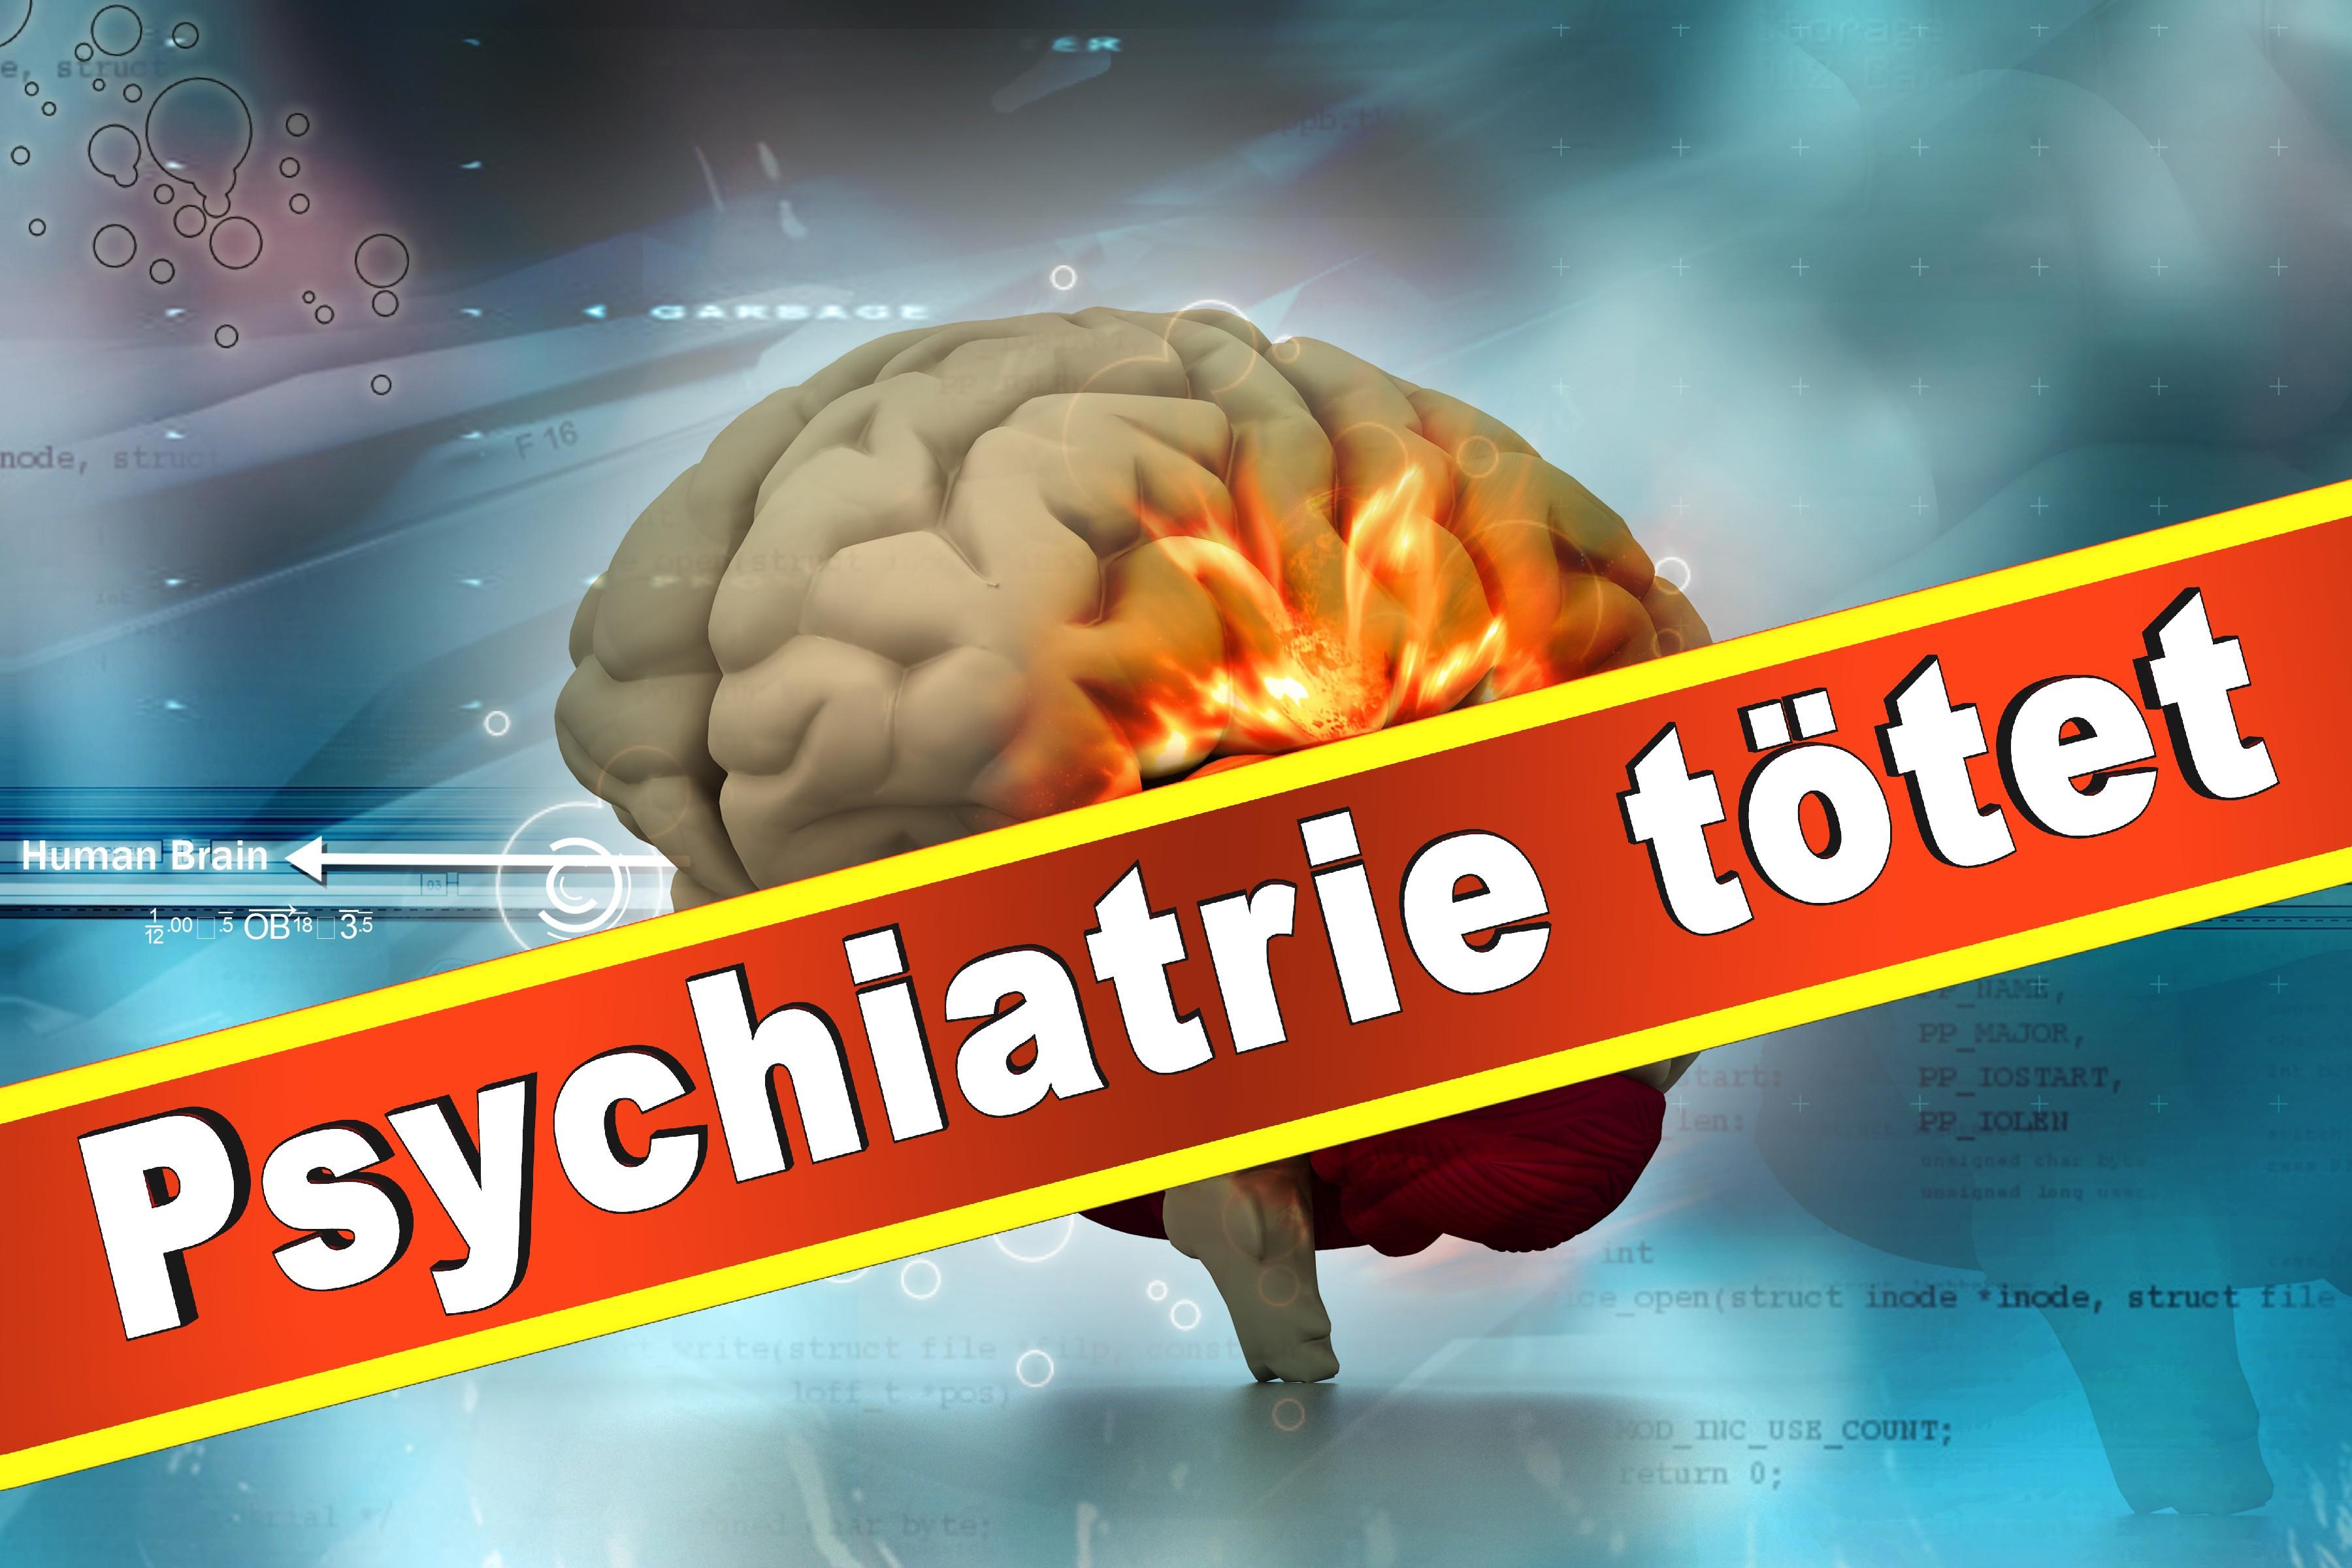 KRH Psychiatrie Langenhagen Psychiatrie Psychiatrische Klinik Krankenhaus Langenhagen